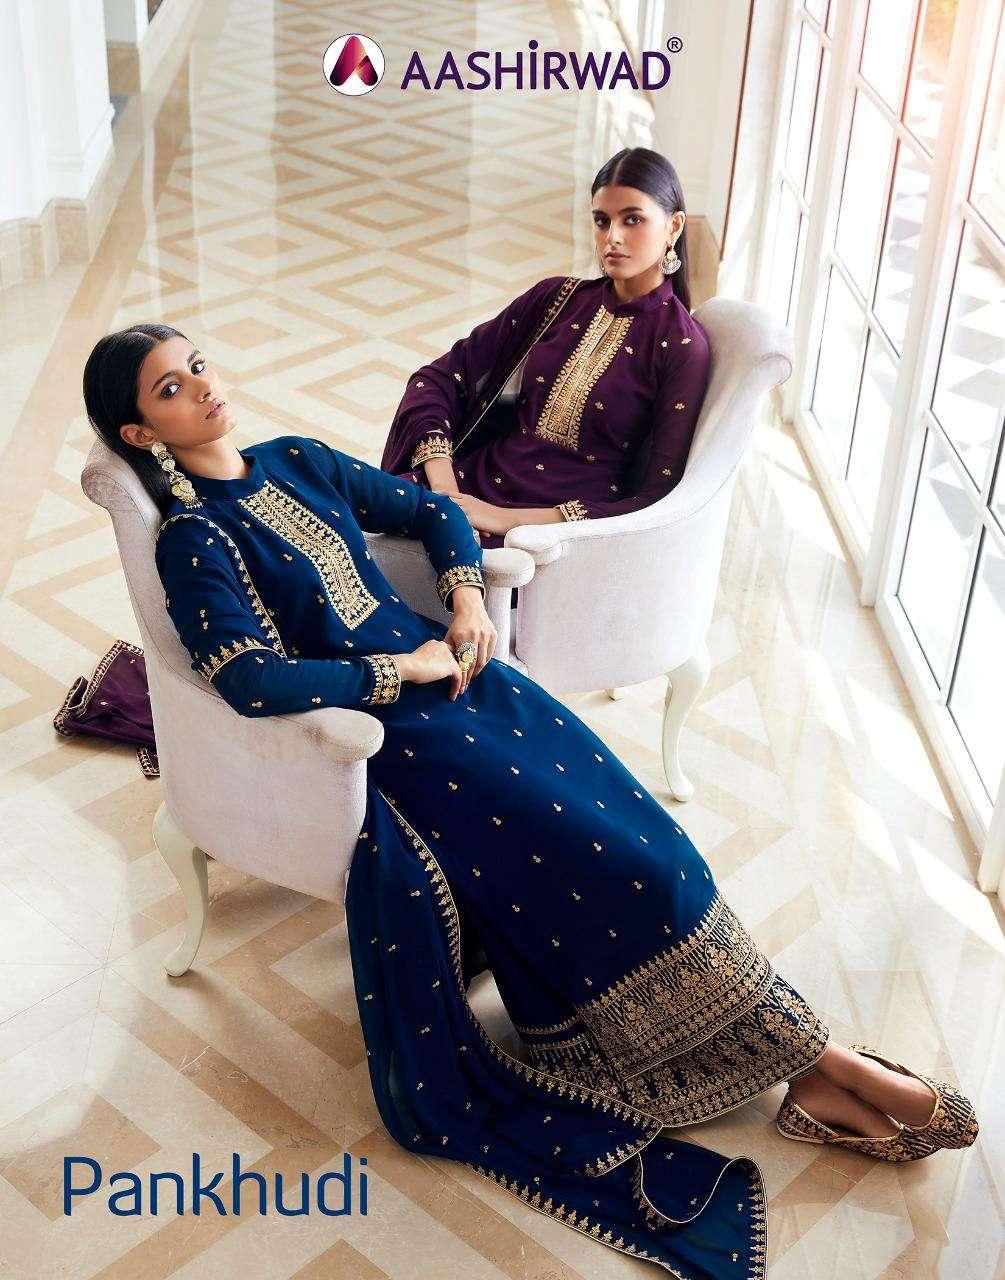 Aashirwad Creation Pankhudi Real Georgette With Embroidery Work Salwar Kameez Collection